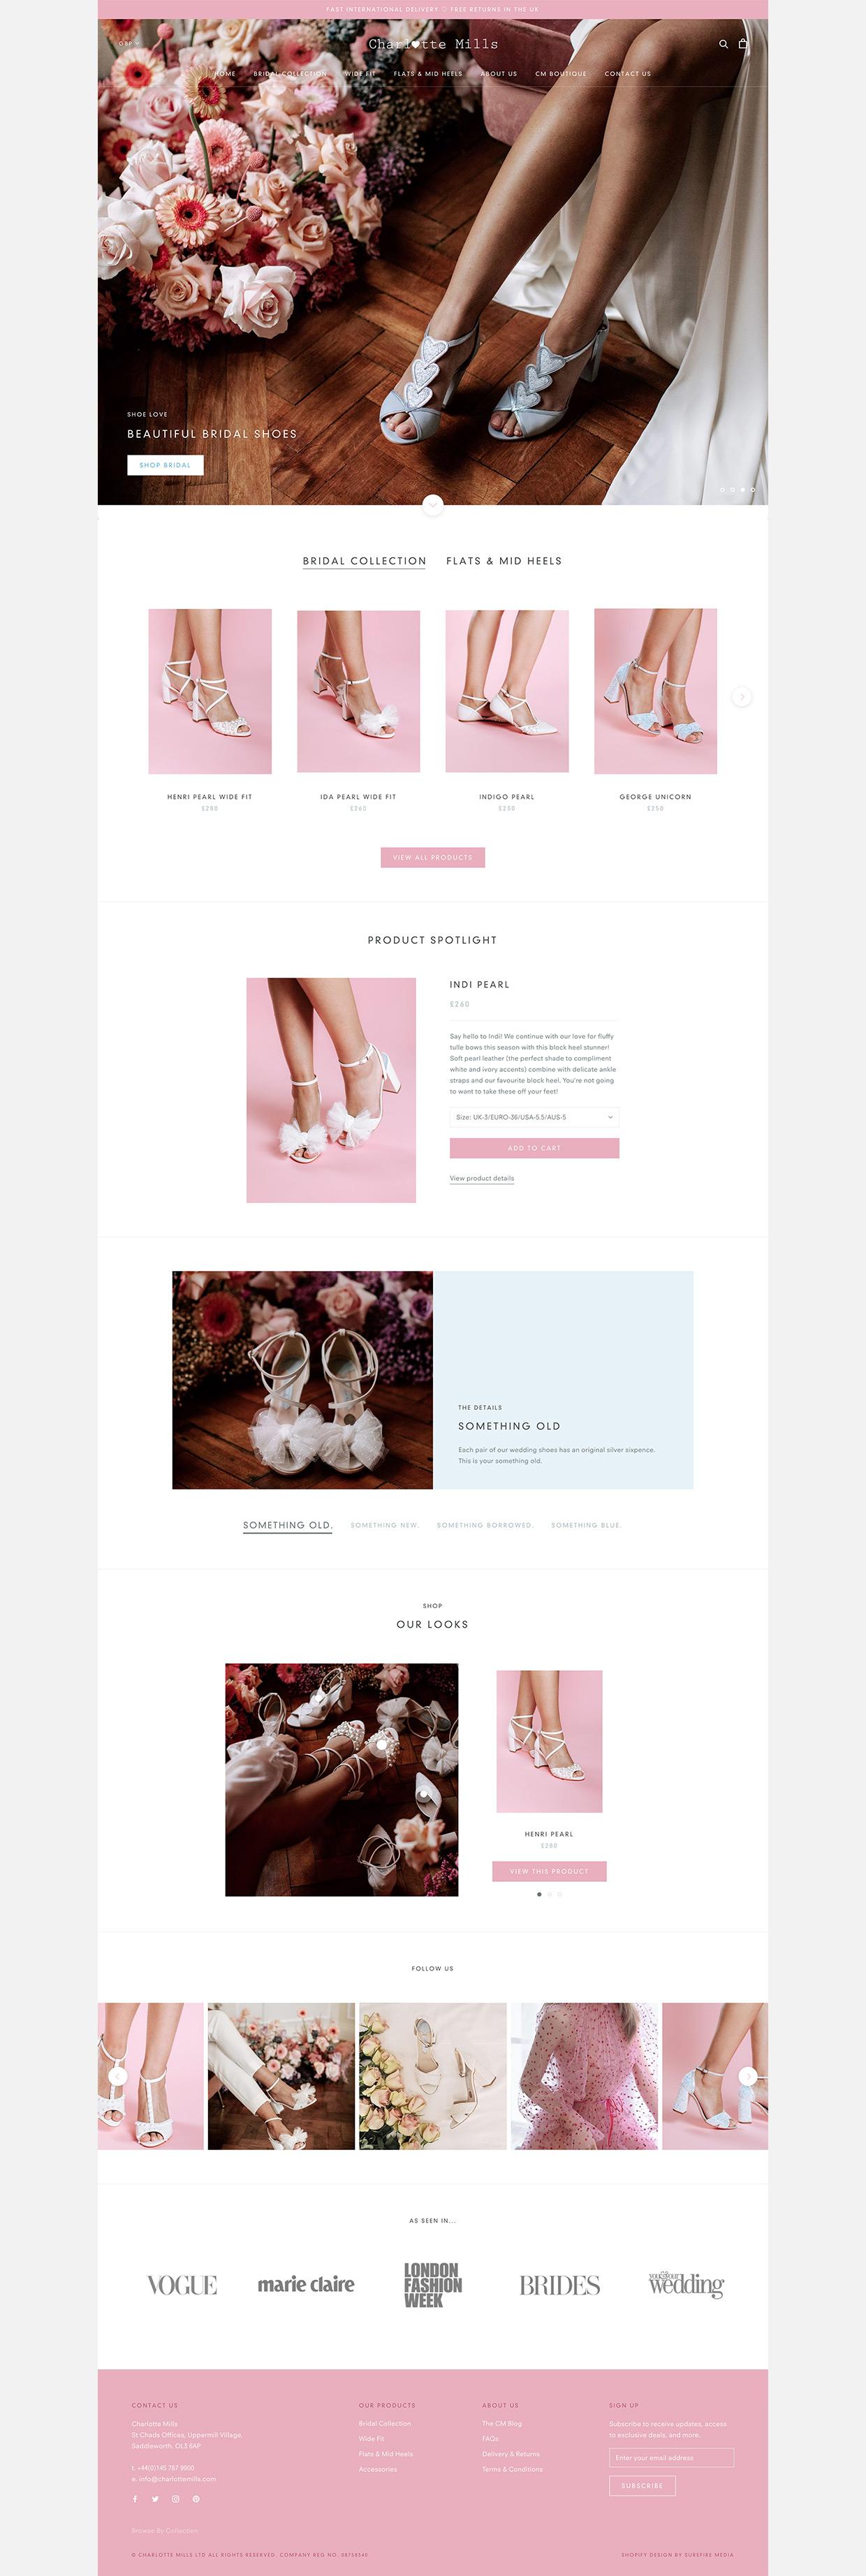 Charlotte Mills Website